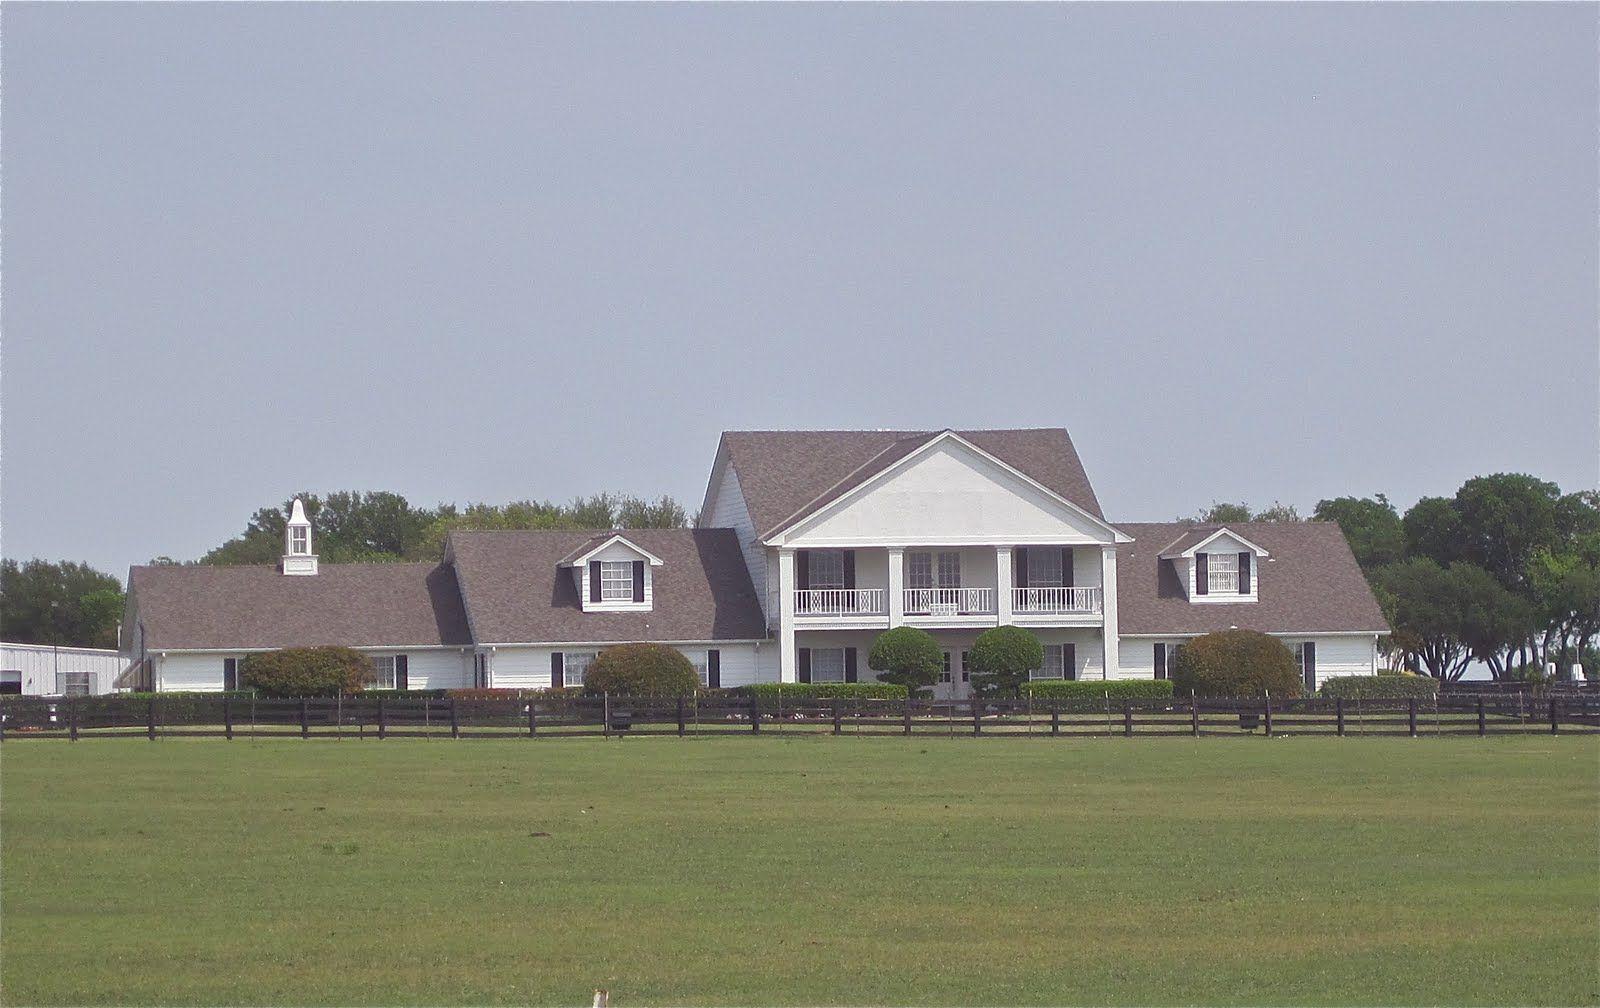 Dallas tv show flight plan southfork ranch is hopping again can jr be